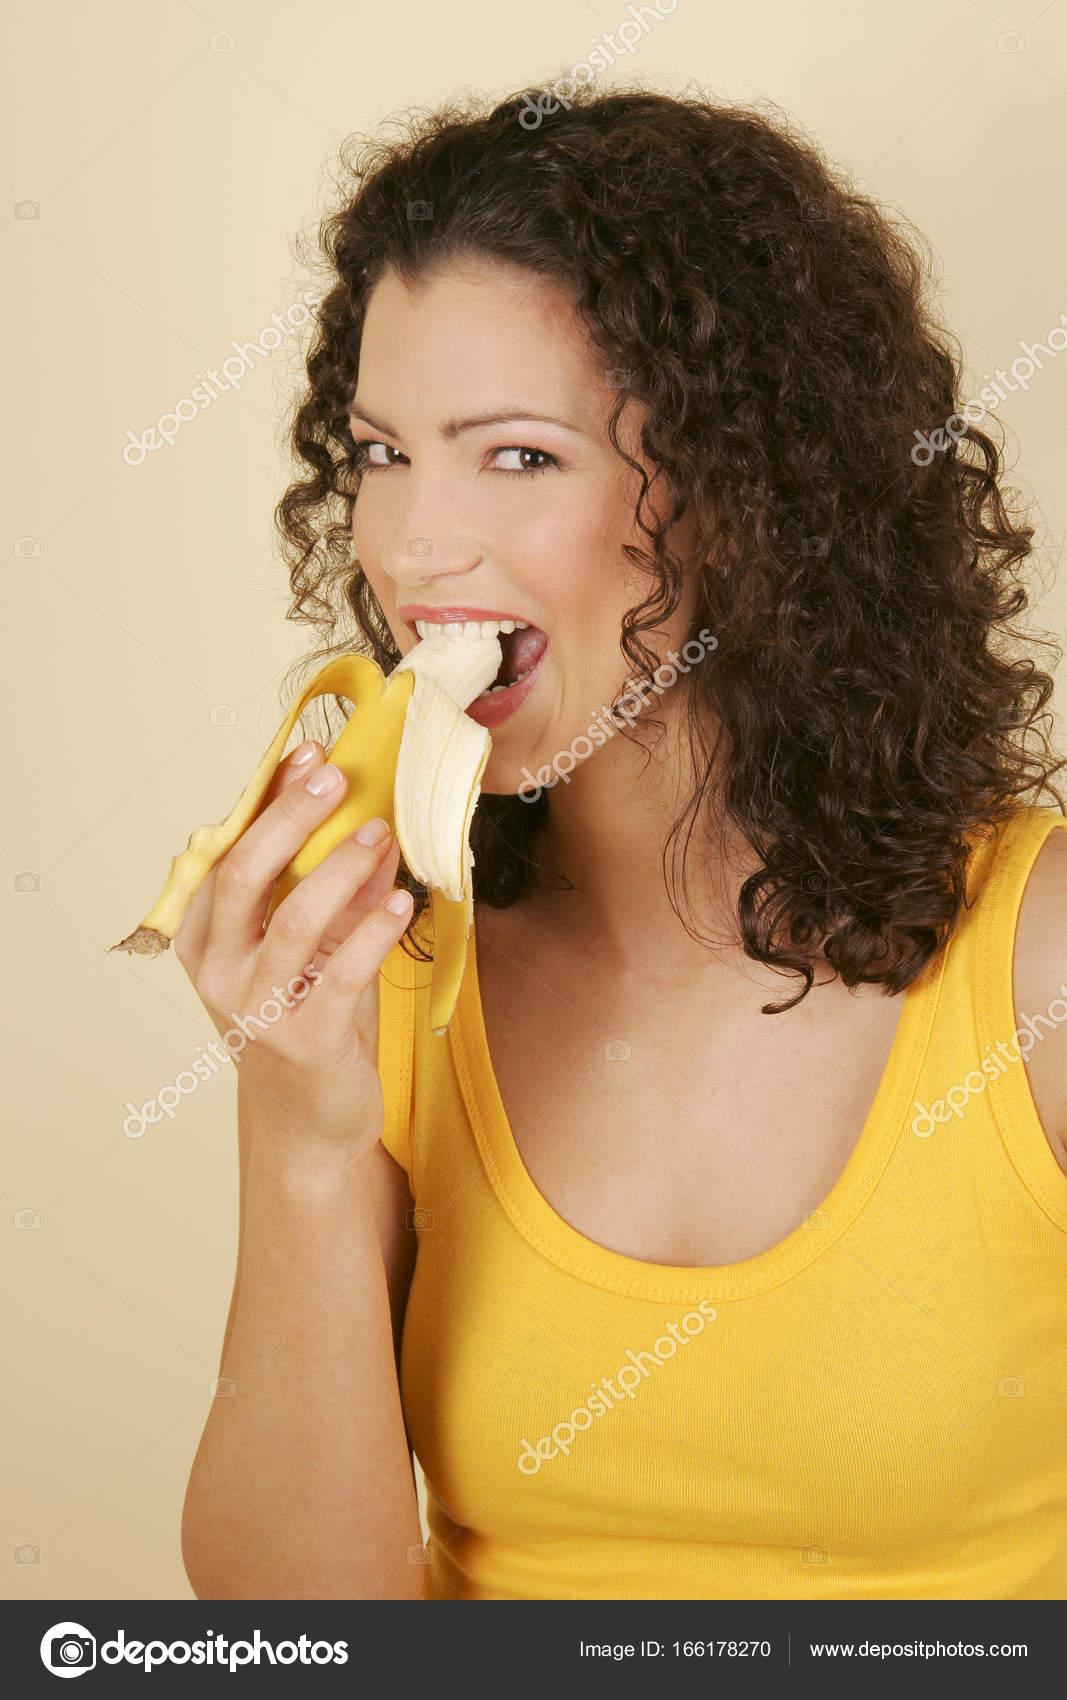 une femme qui mange une banane photographie juiceimagesenterprise 166178270. Black Bedroom Furniture Sets. Home Design Ideas